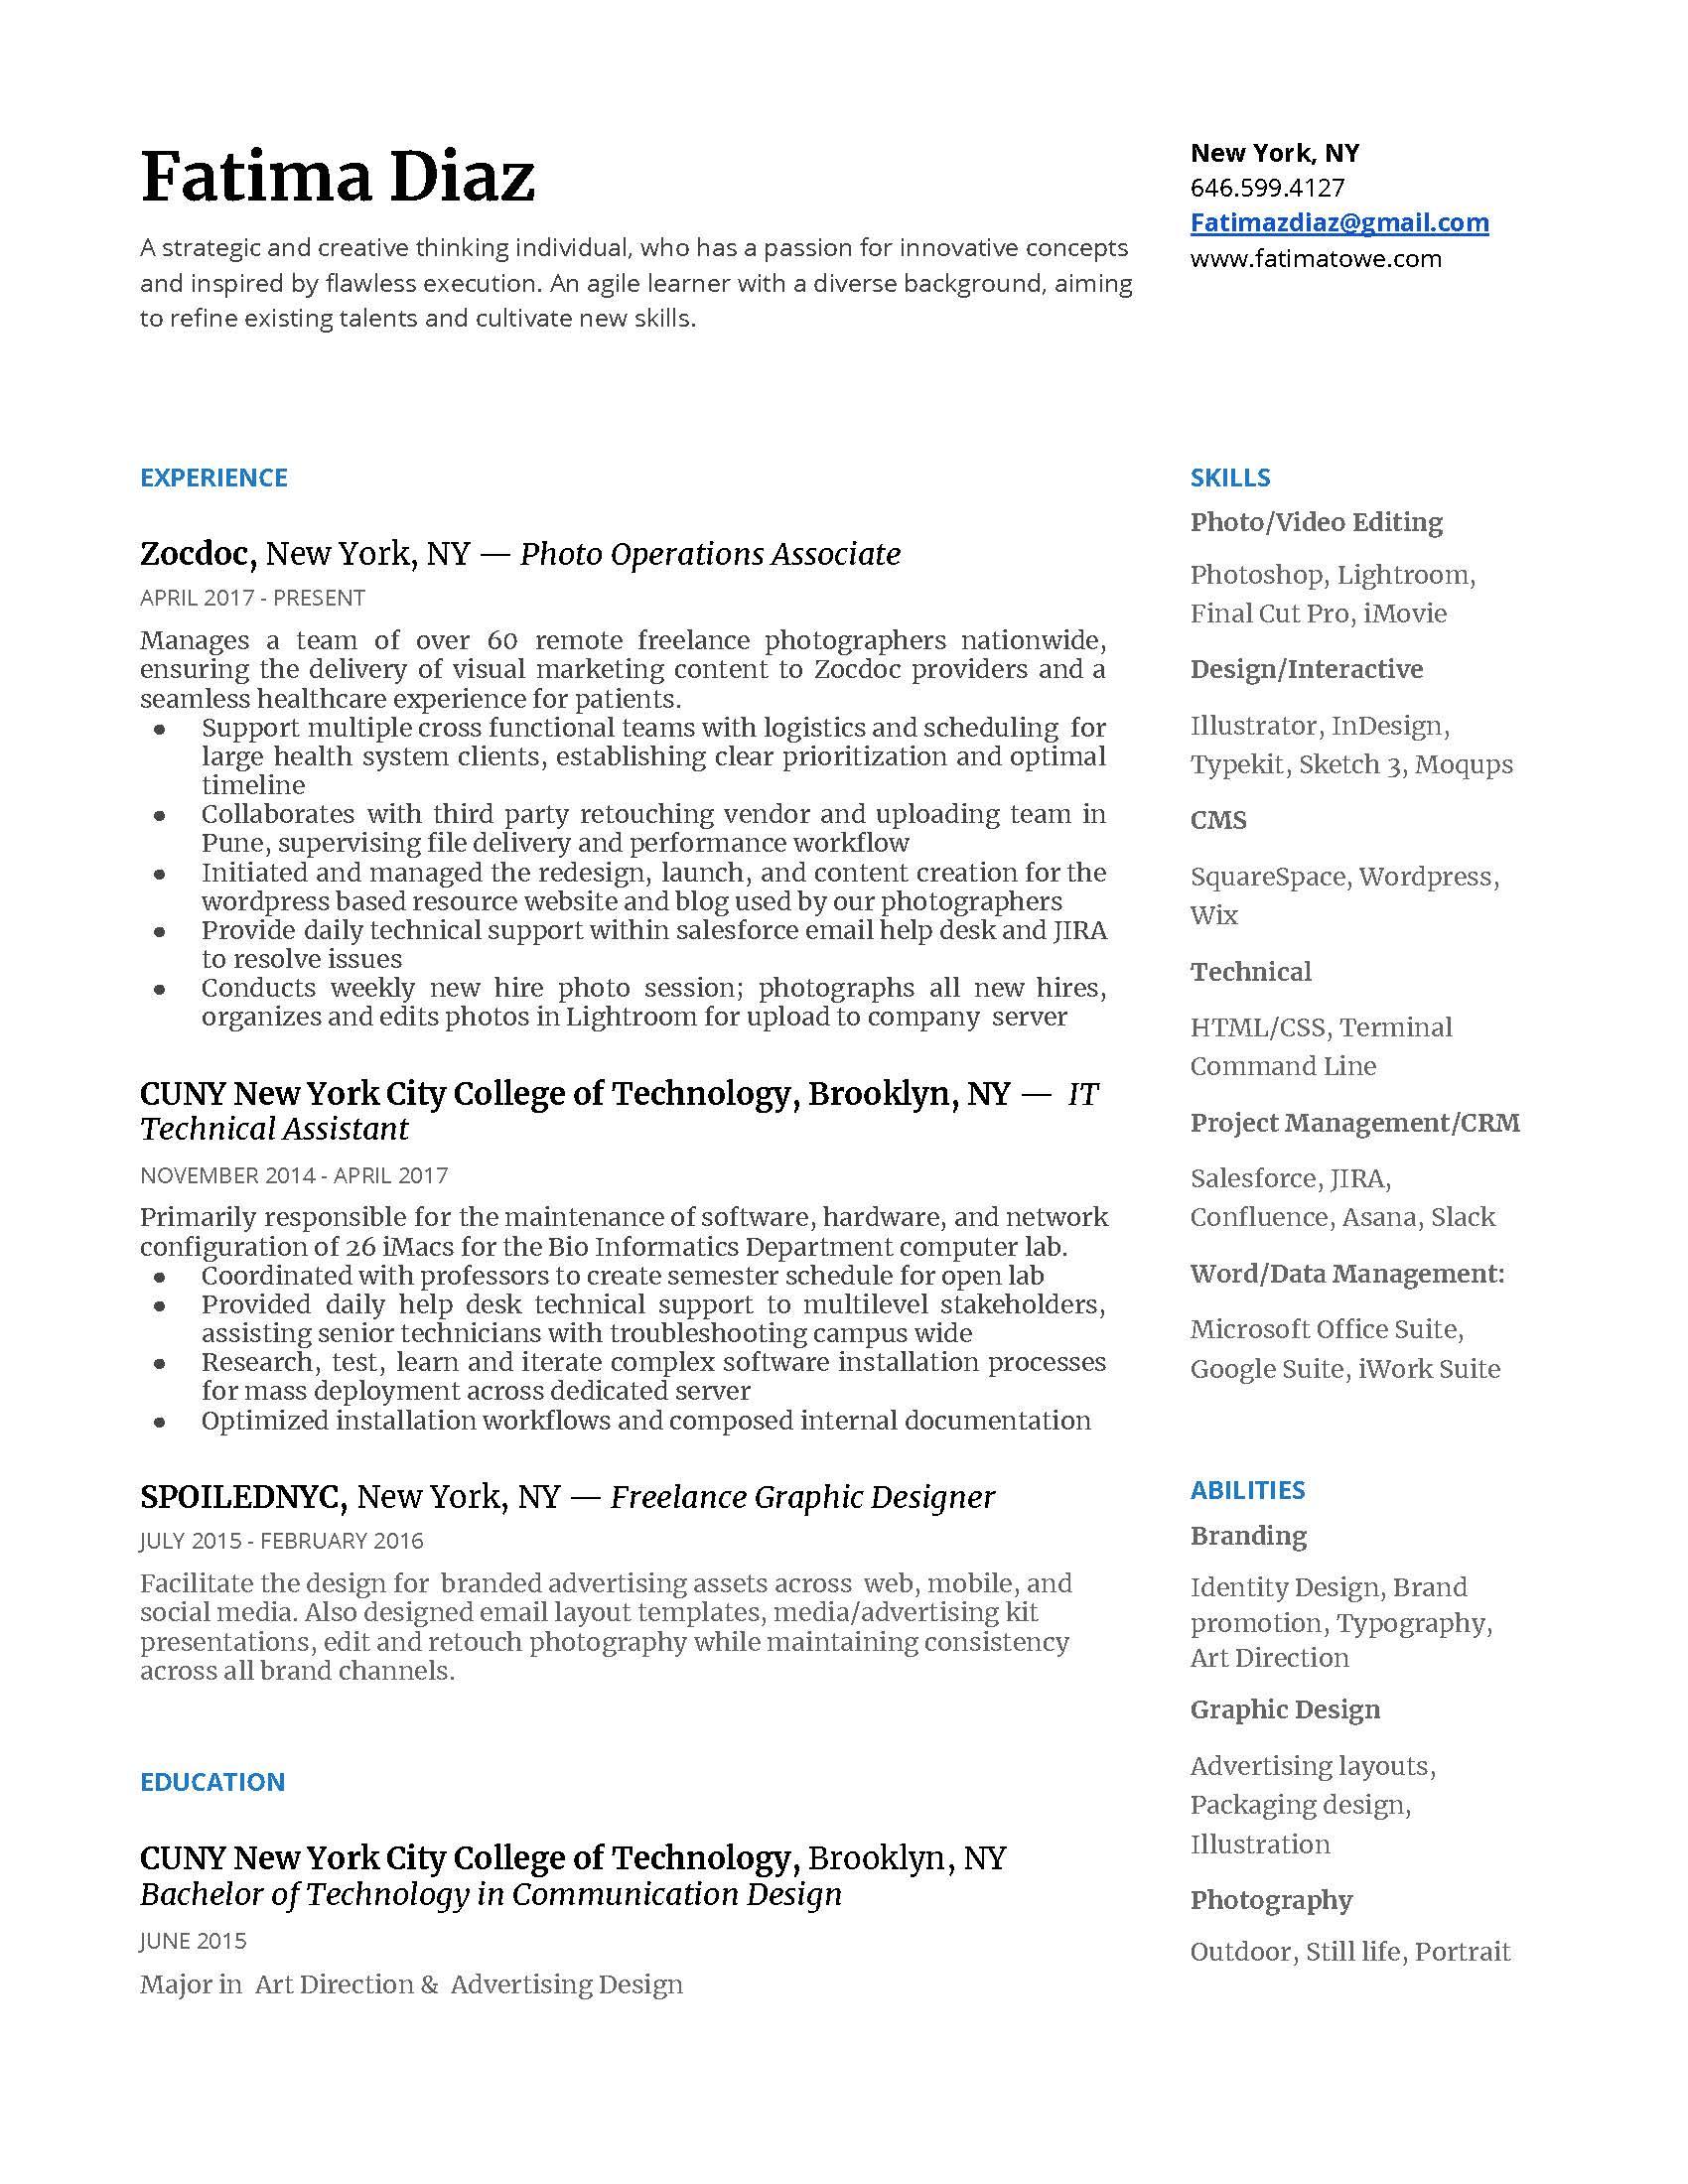 Creative Resume_Page_1.jpg